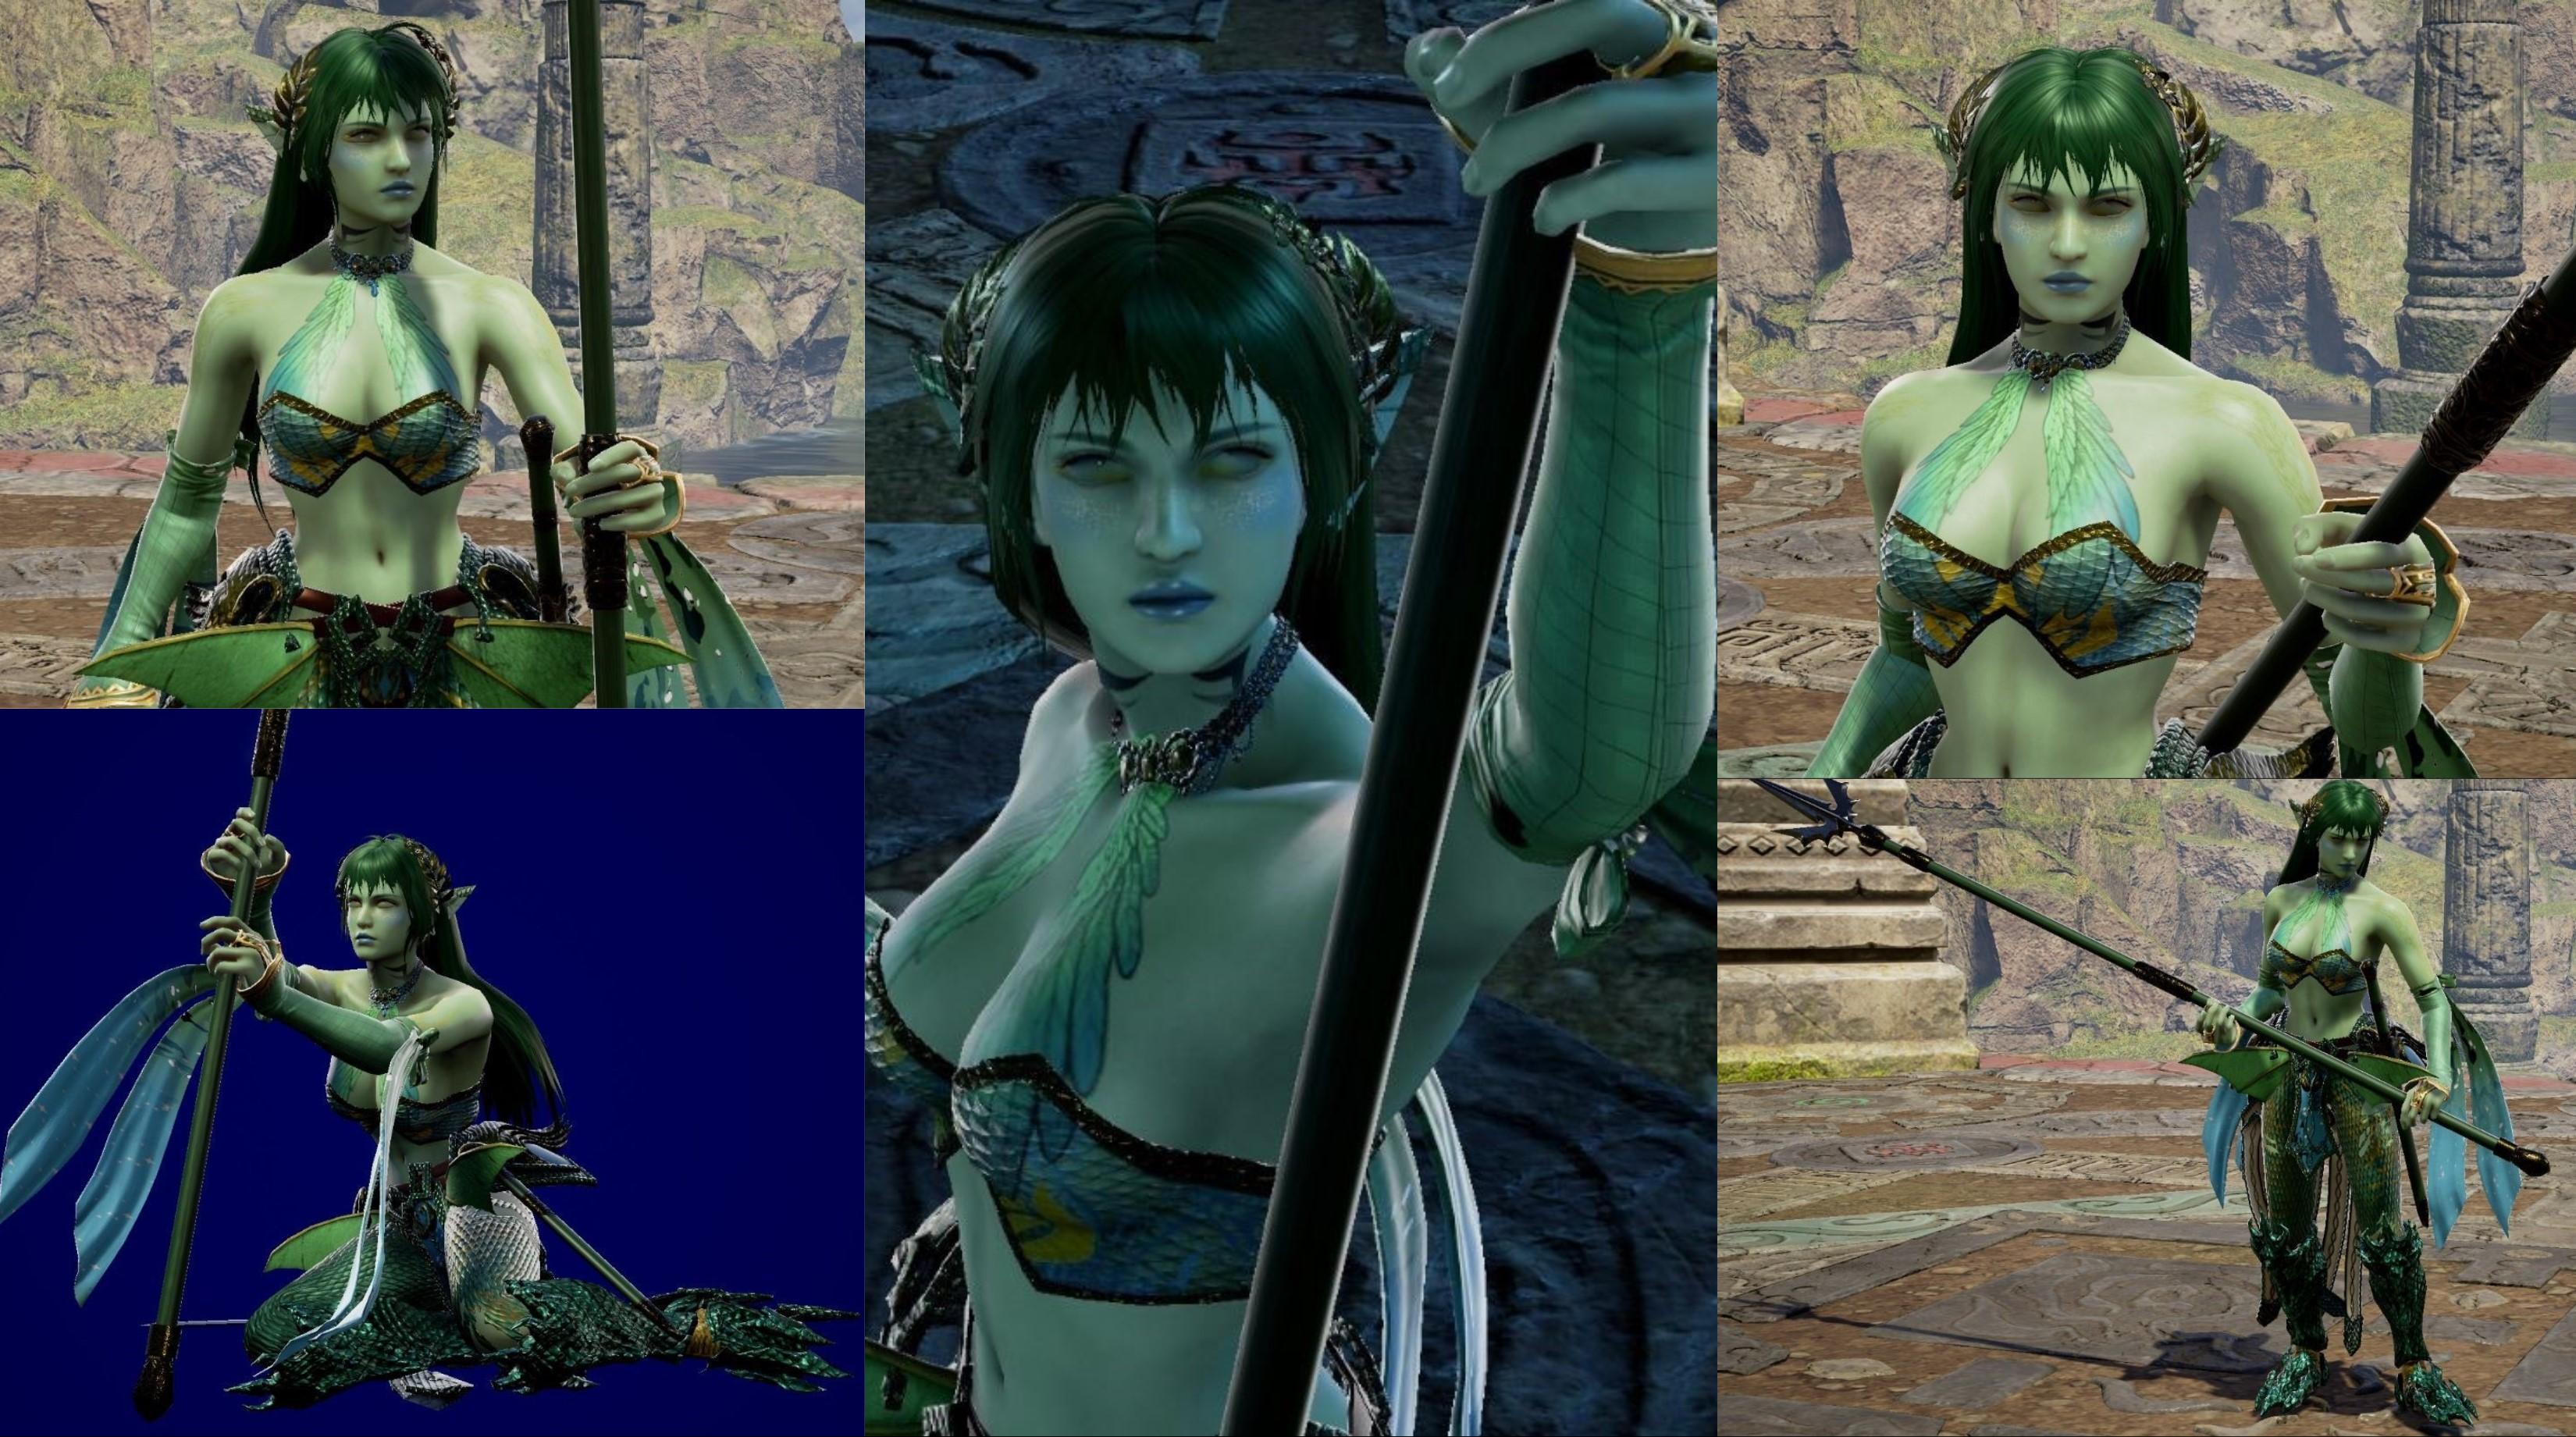 Nerine soul cal collage 2.jpg